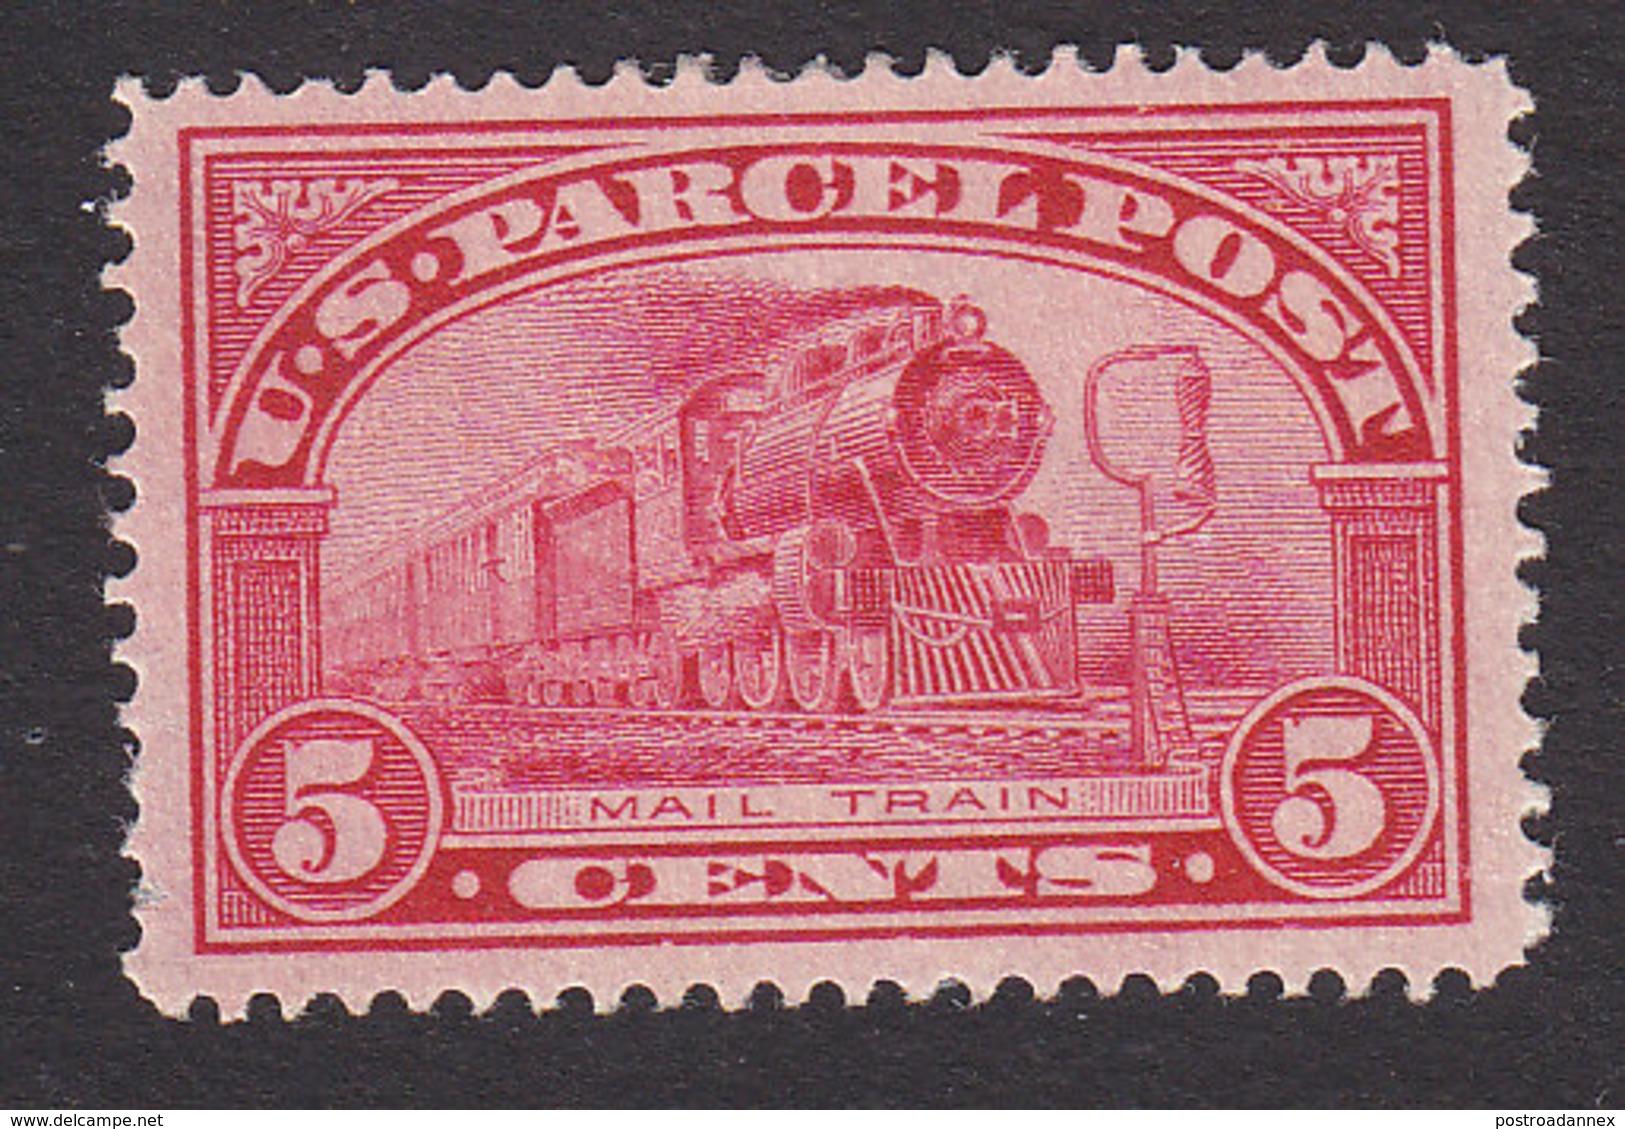 United States, Scott #Q5, Mint Hinged, Mail Train, Issued 1913 - Paketmarken